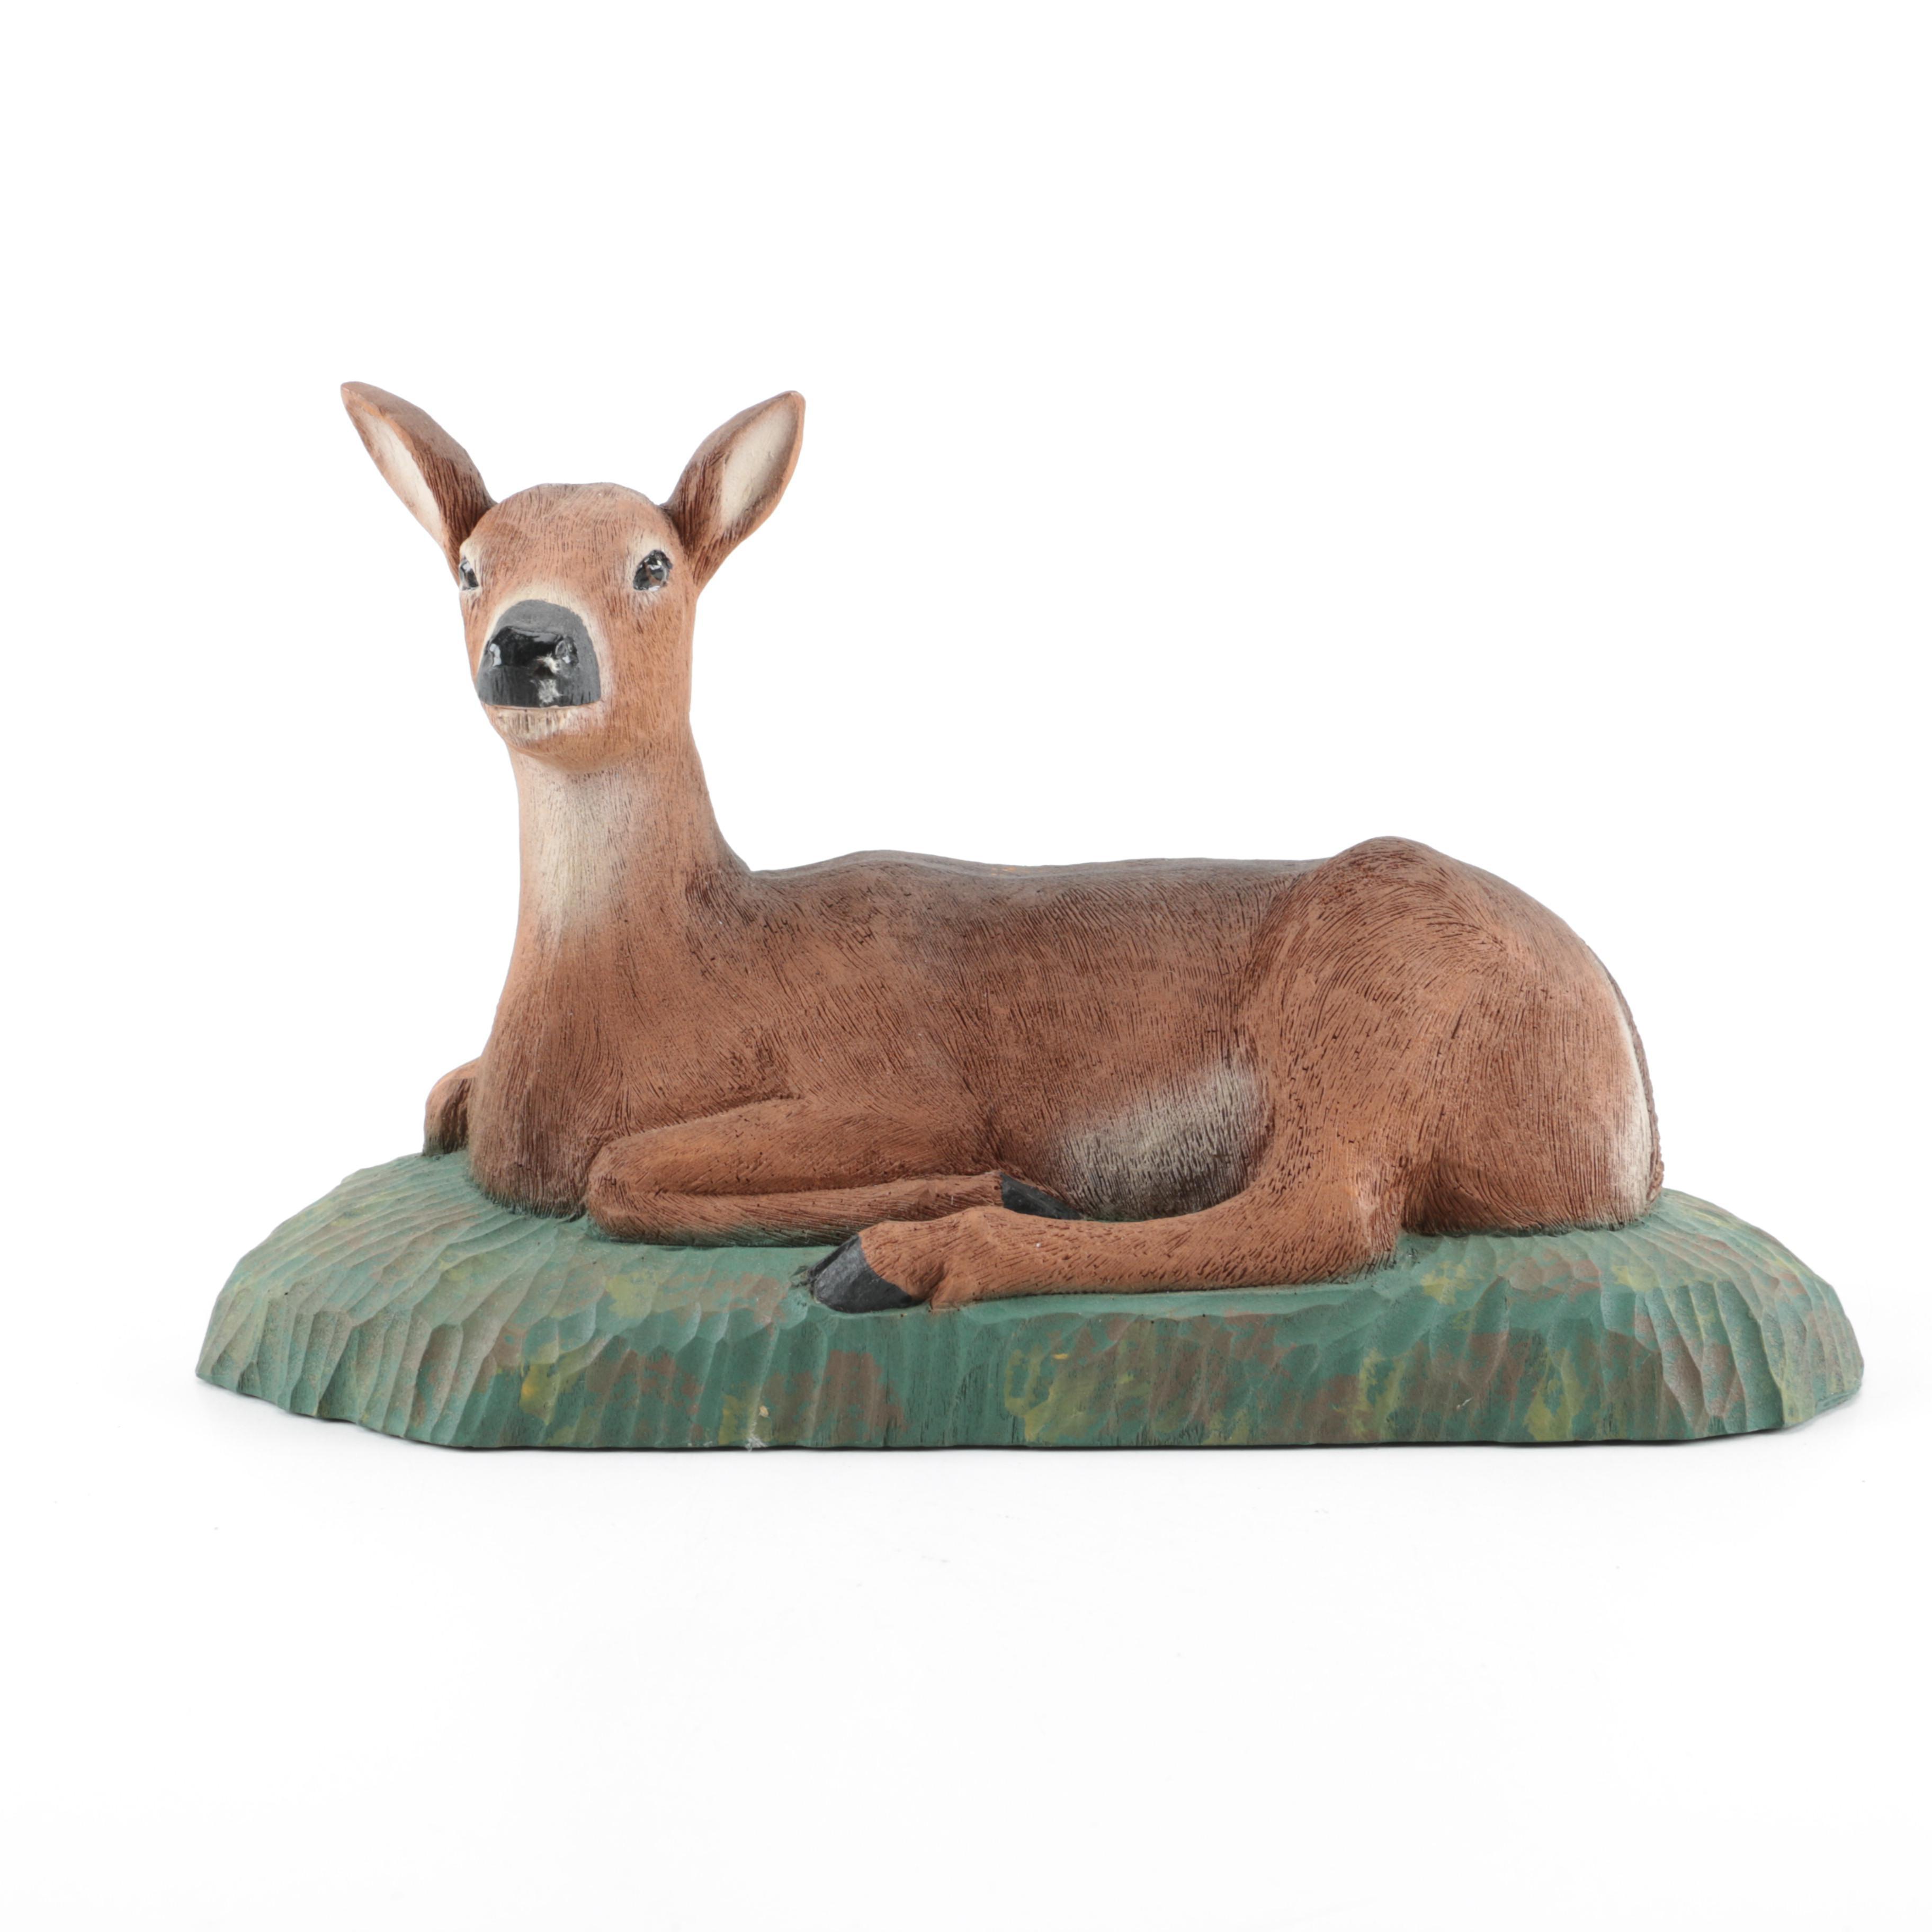 Vintage Hand-Carved Deer Figurine